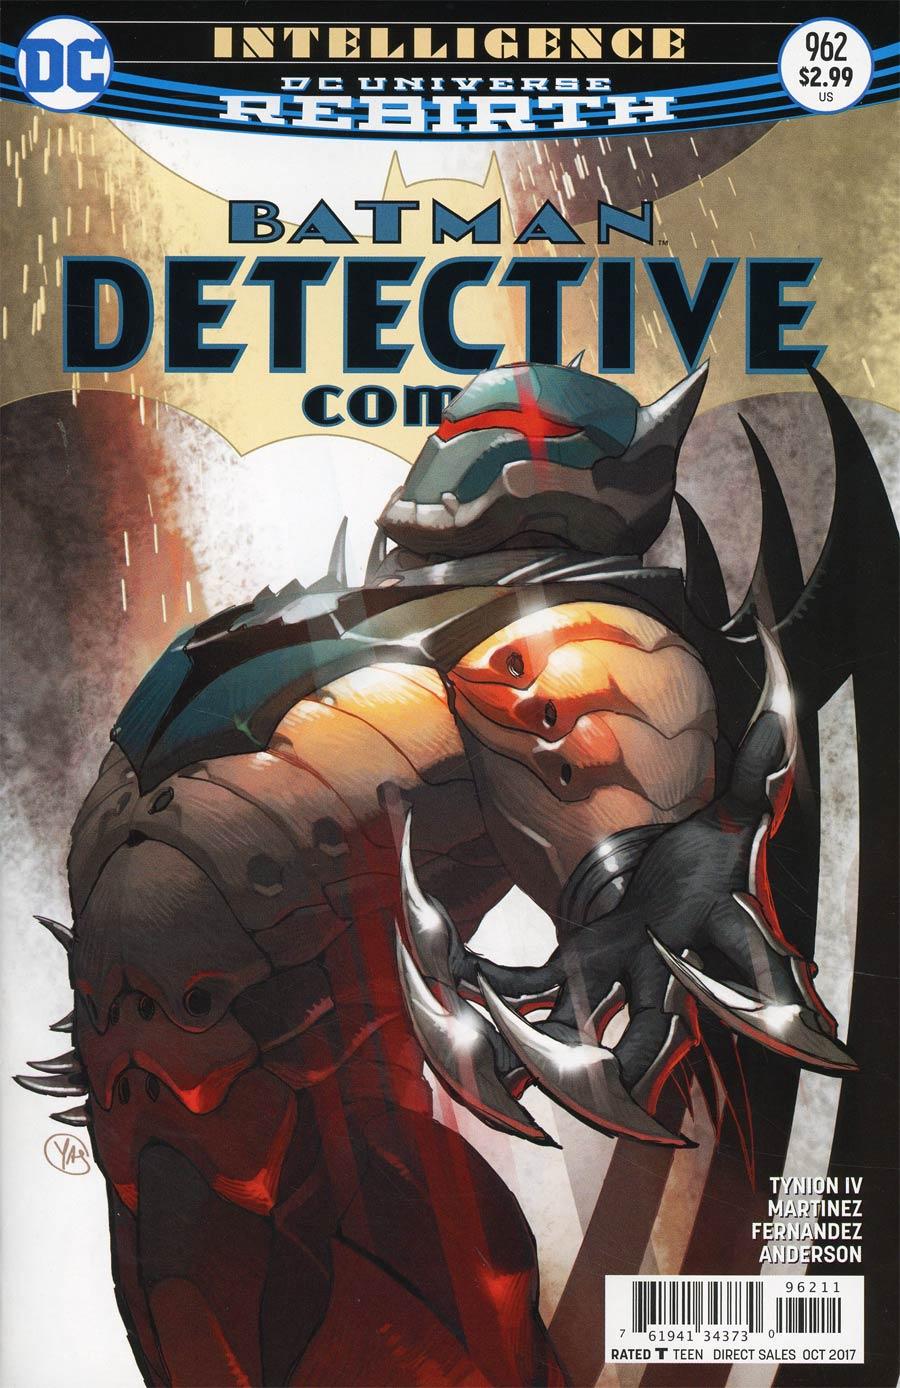 Batman - Detective Comics 962 - Intelligence Finale: Judgment Day